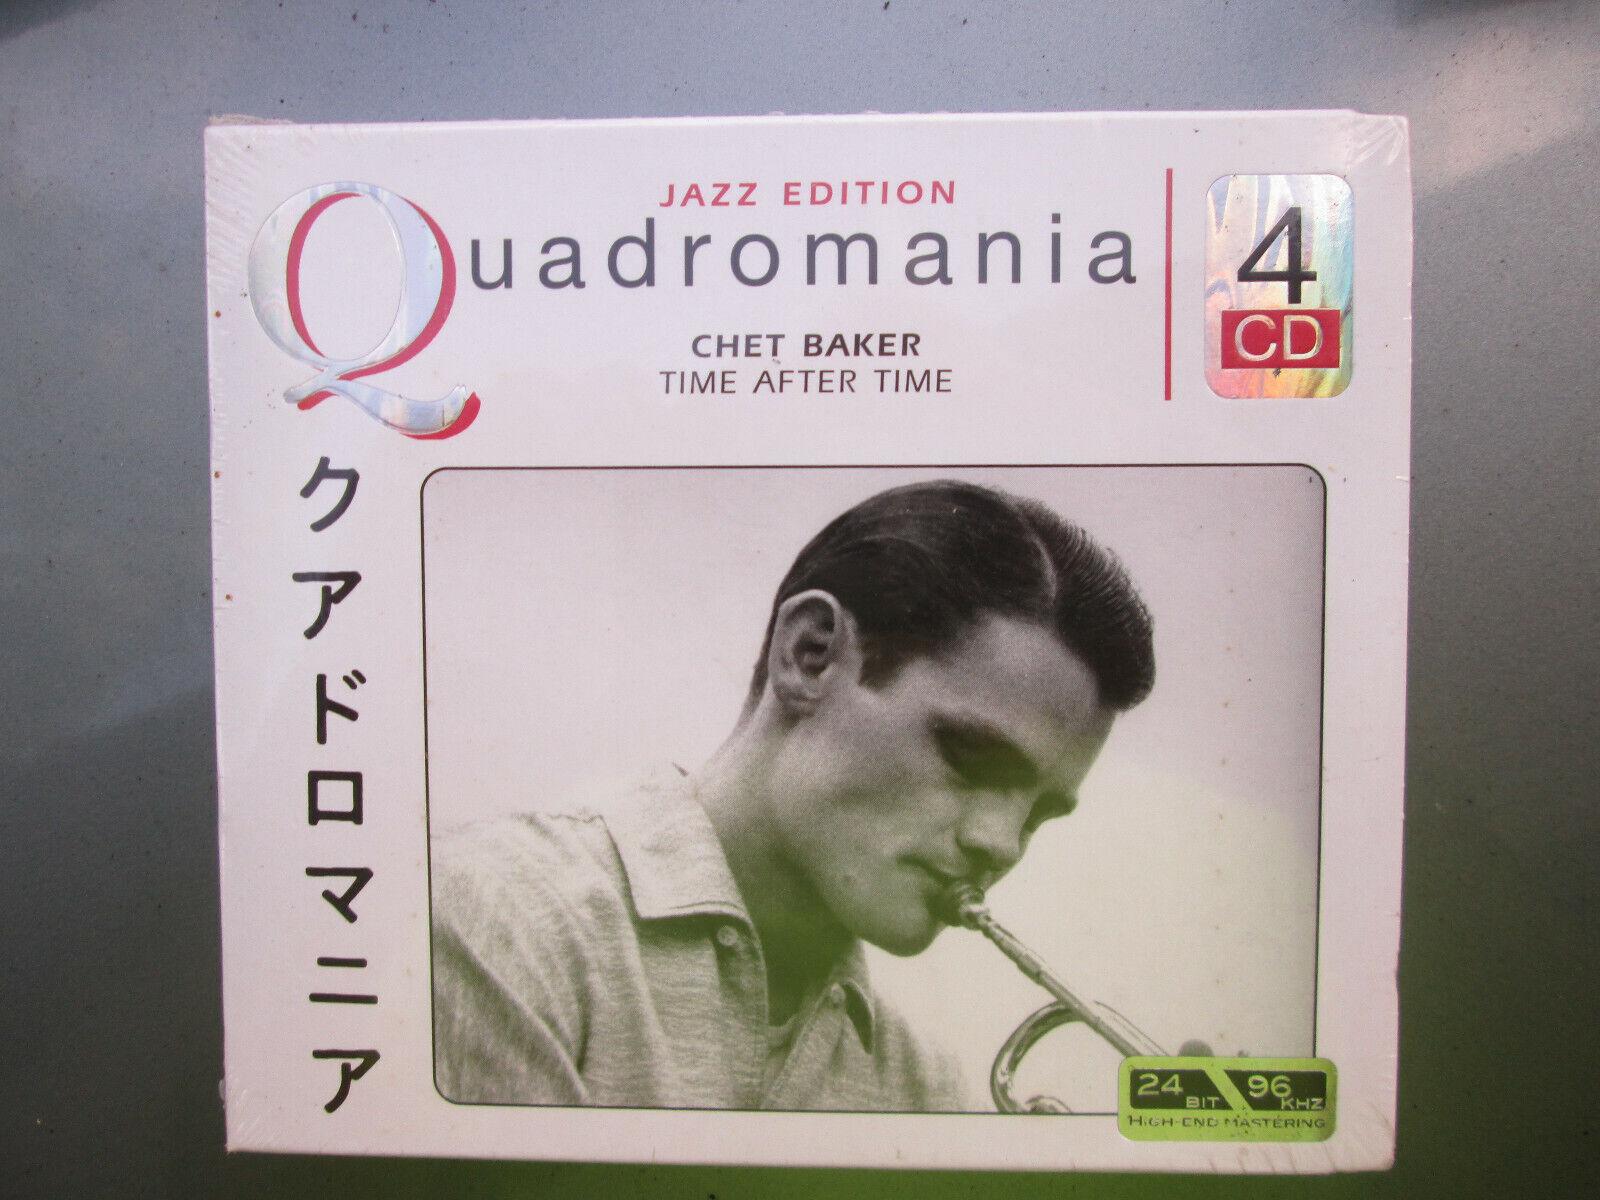 Chet Baker QUADROMANIA Jazz Trumpet - RARE 4 CD Album MINT SEALED COPY  - $59.99